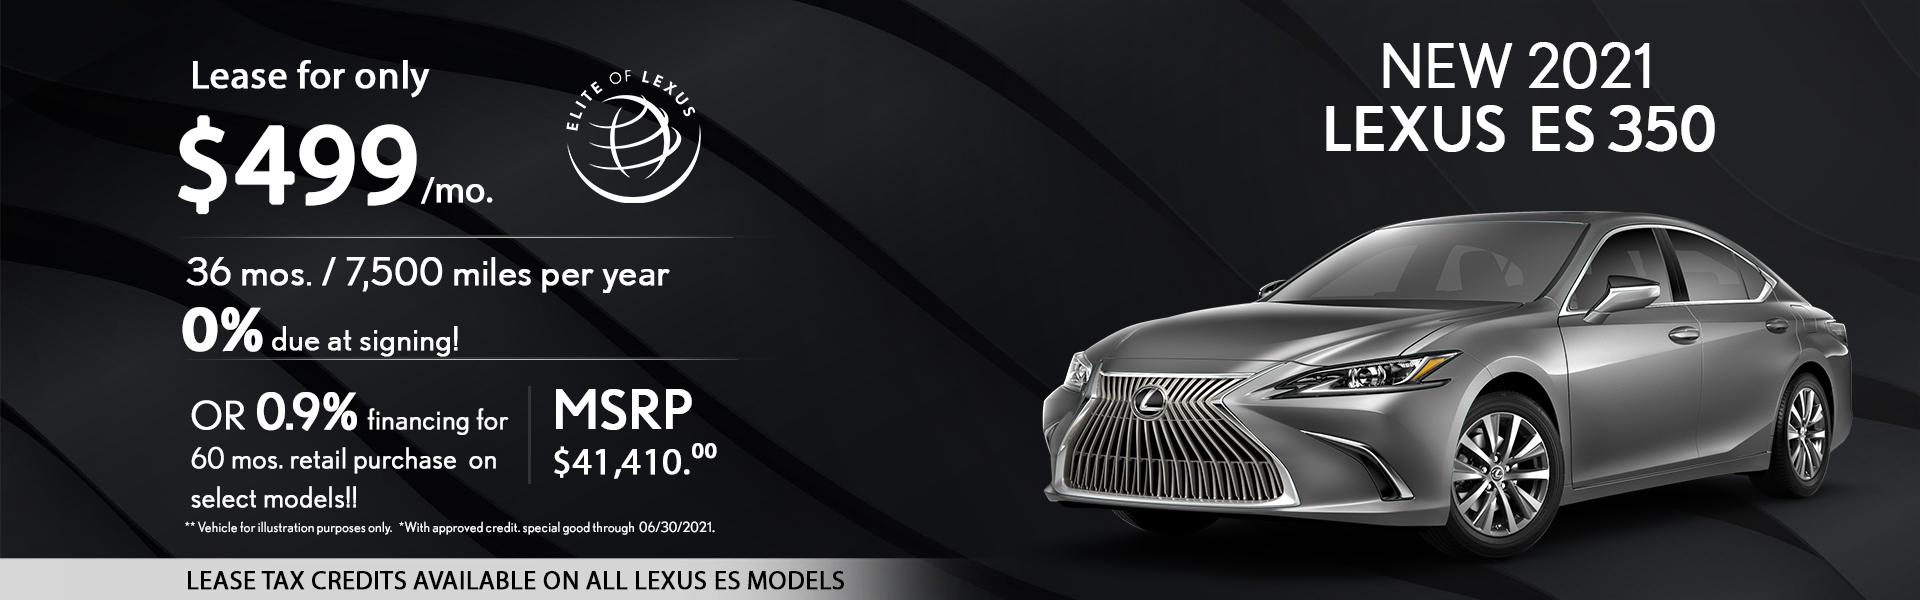 Lexus Es Lease Special